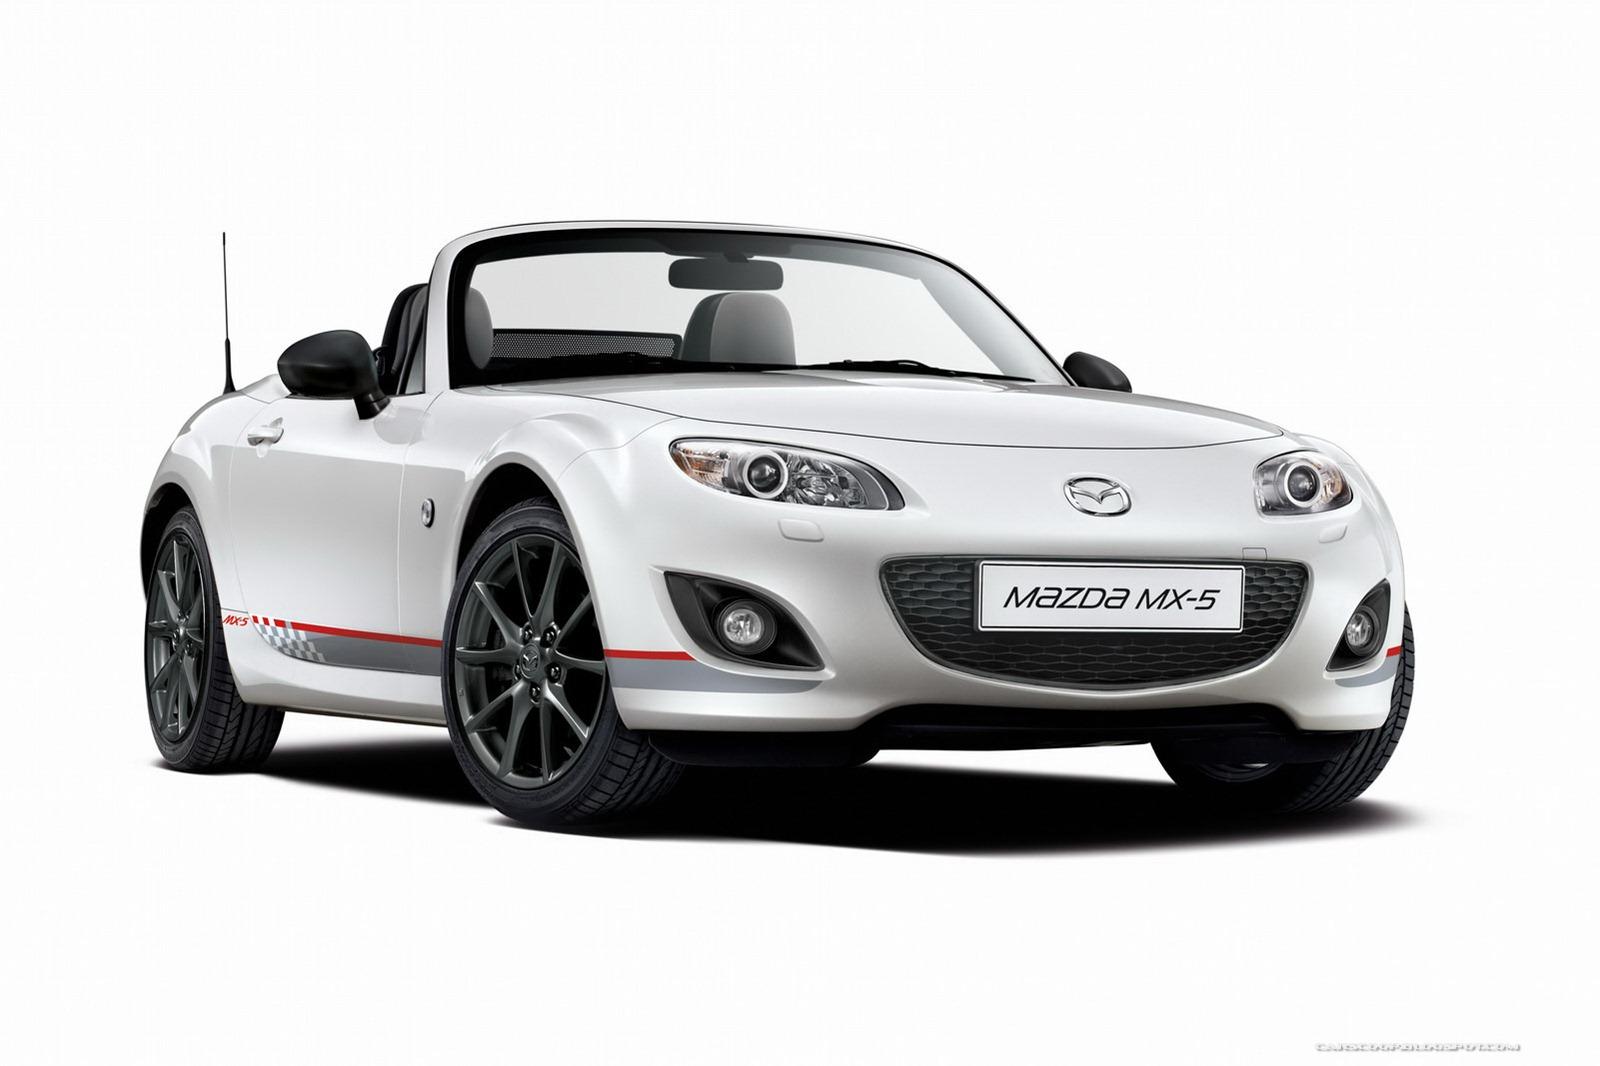 http://1.bp.blogspot.com/-NLupbh7Gpqk/T8yBTHXe1yI/AAAAAAAAgpk/5ijdaA5QZPU/s1600/Mazda-MX-5-Senshu-3%255B2%255D.jpg